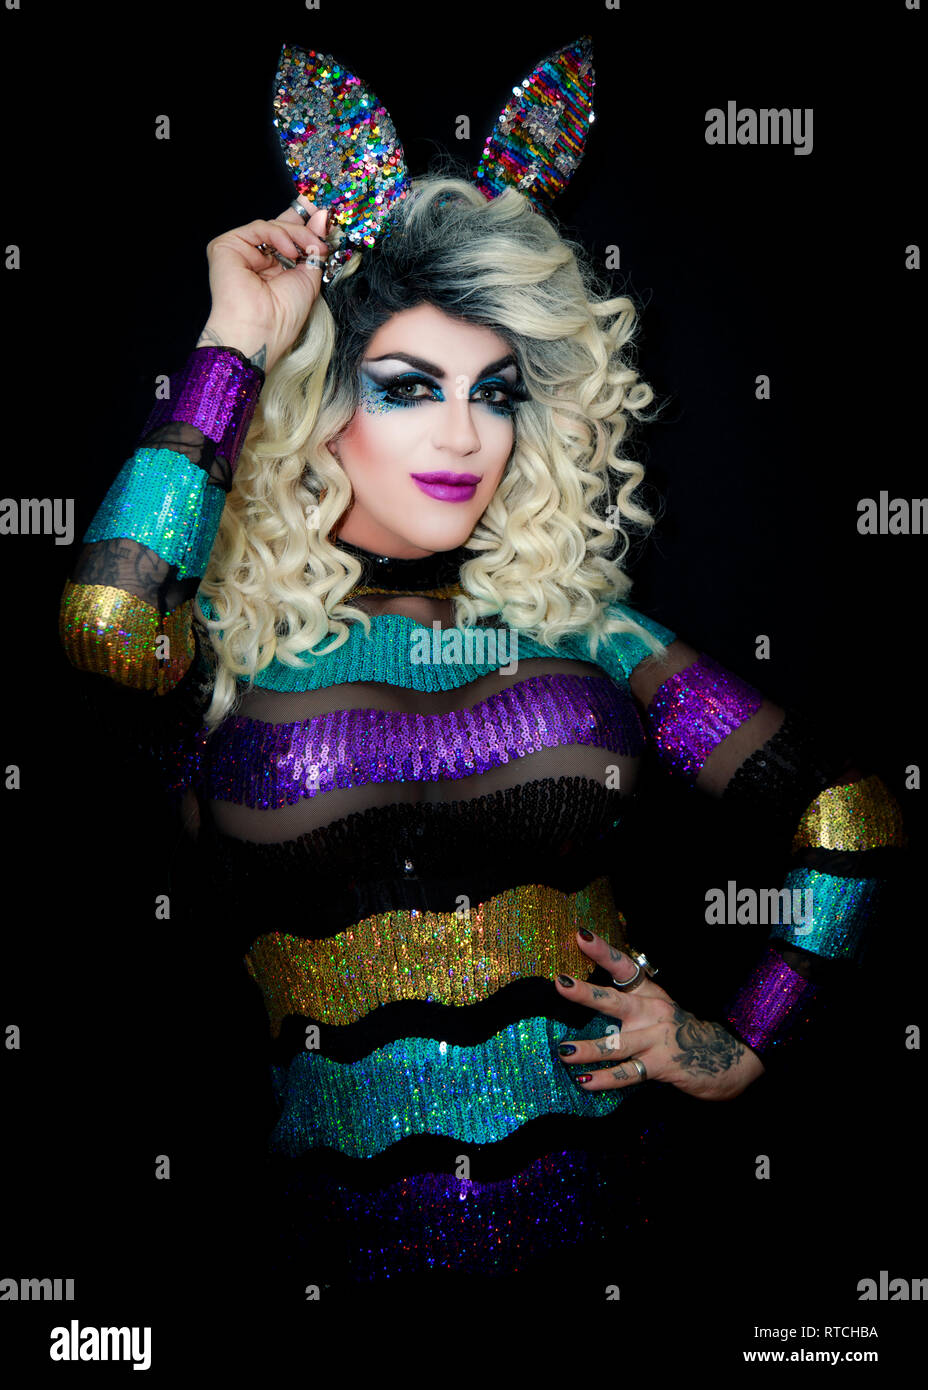 Shyanne O'Shea, Southend, Essex © Clarissa Debenham / Alamy - Stock Image